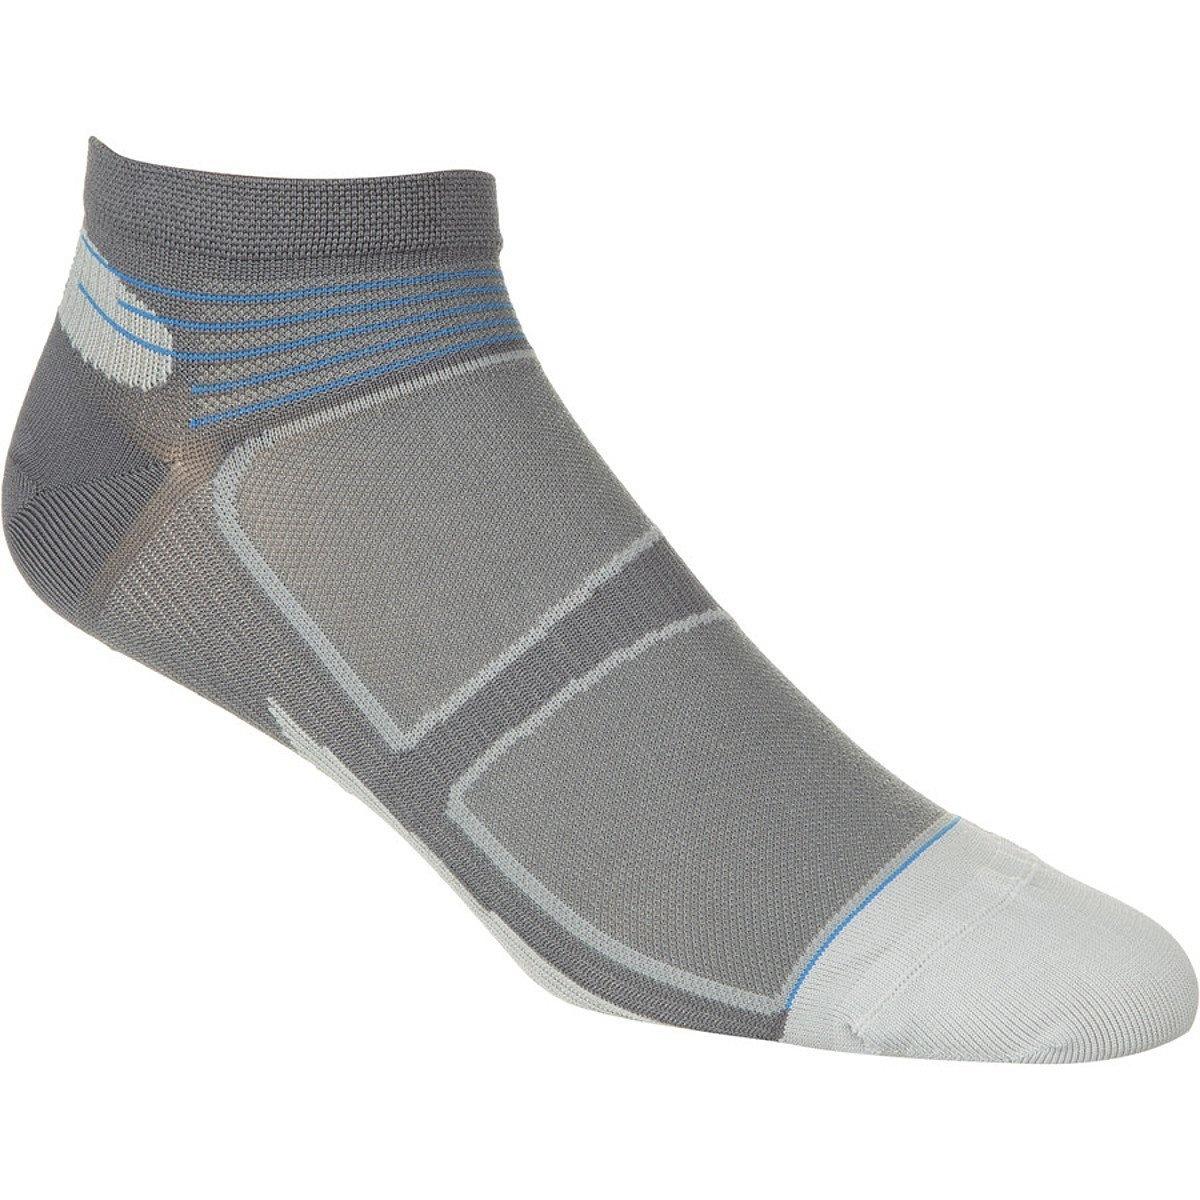 Feetures! Elite Ultra Light Low Cut